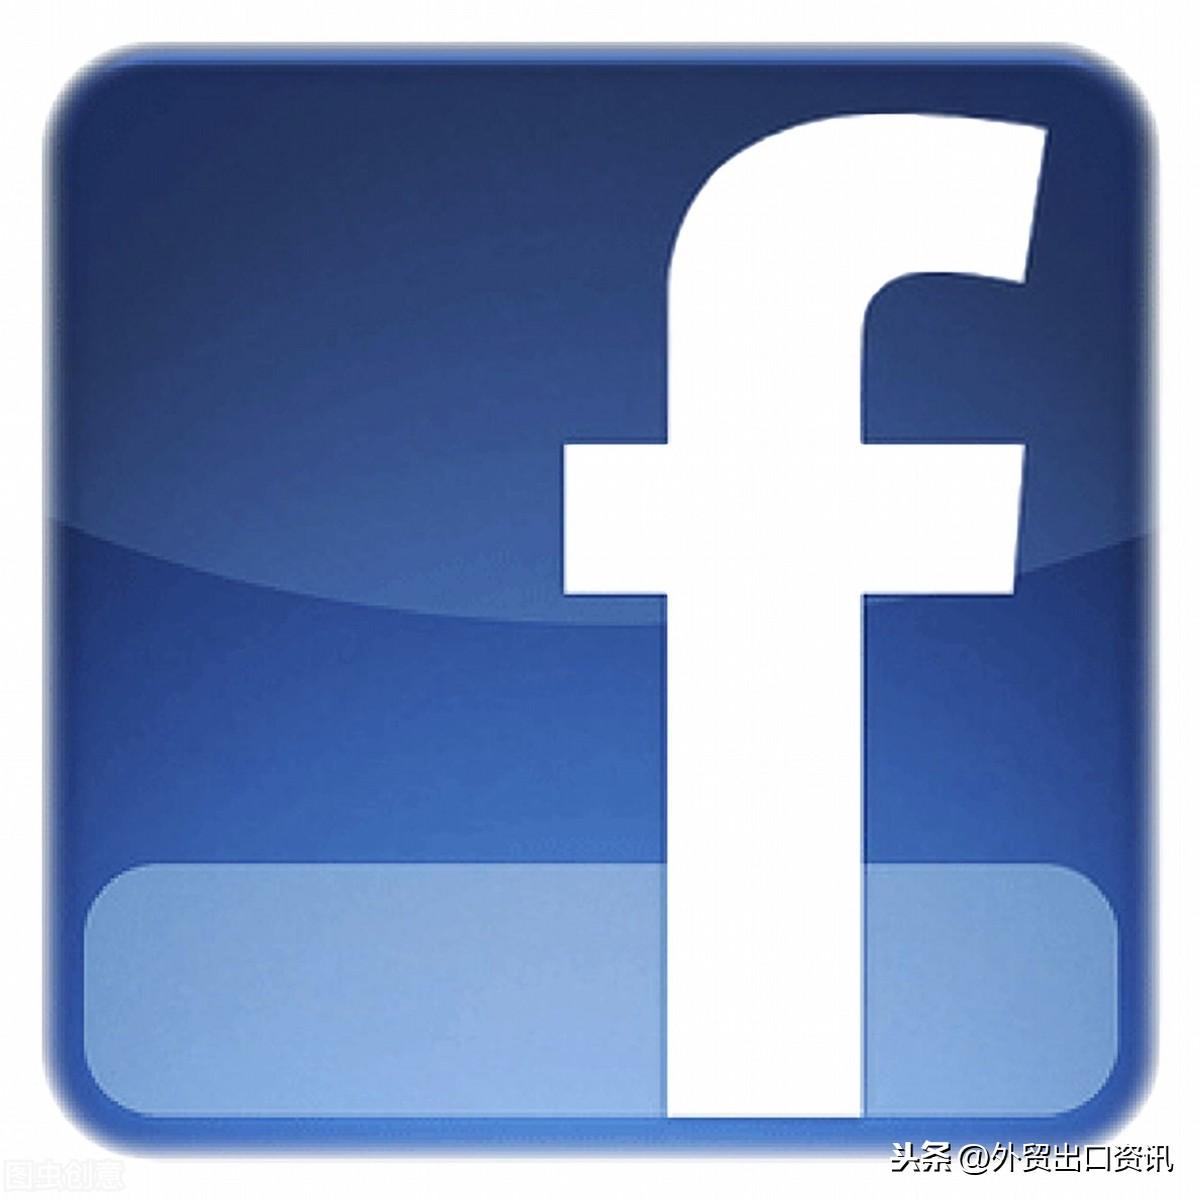 Facebook 有趣的5点营销技巧,你知道几点?